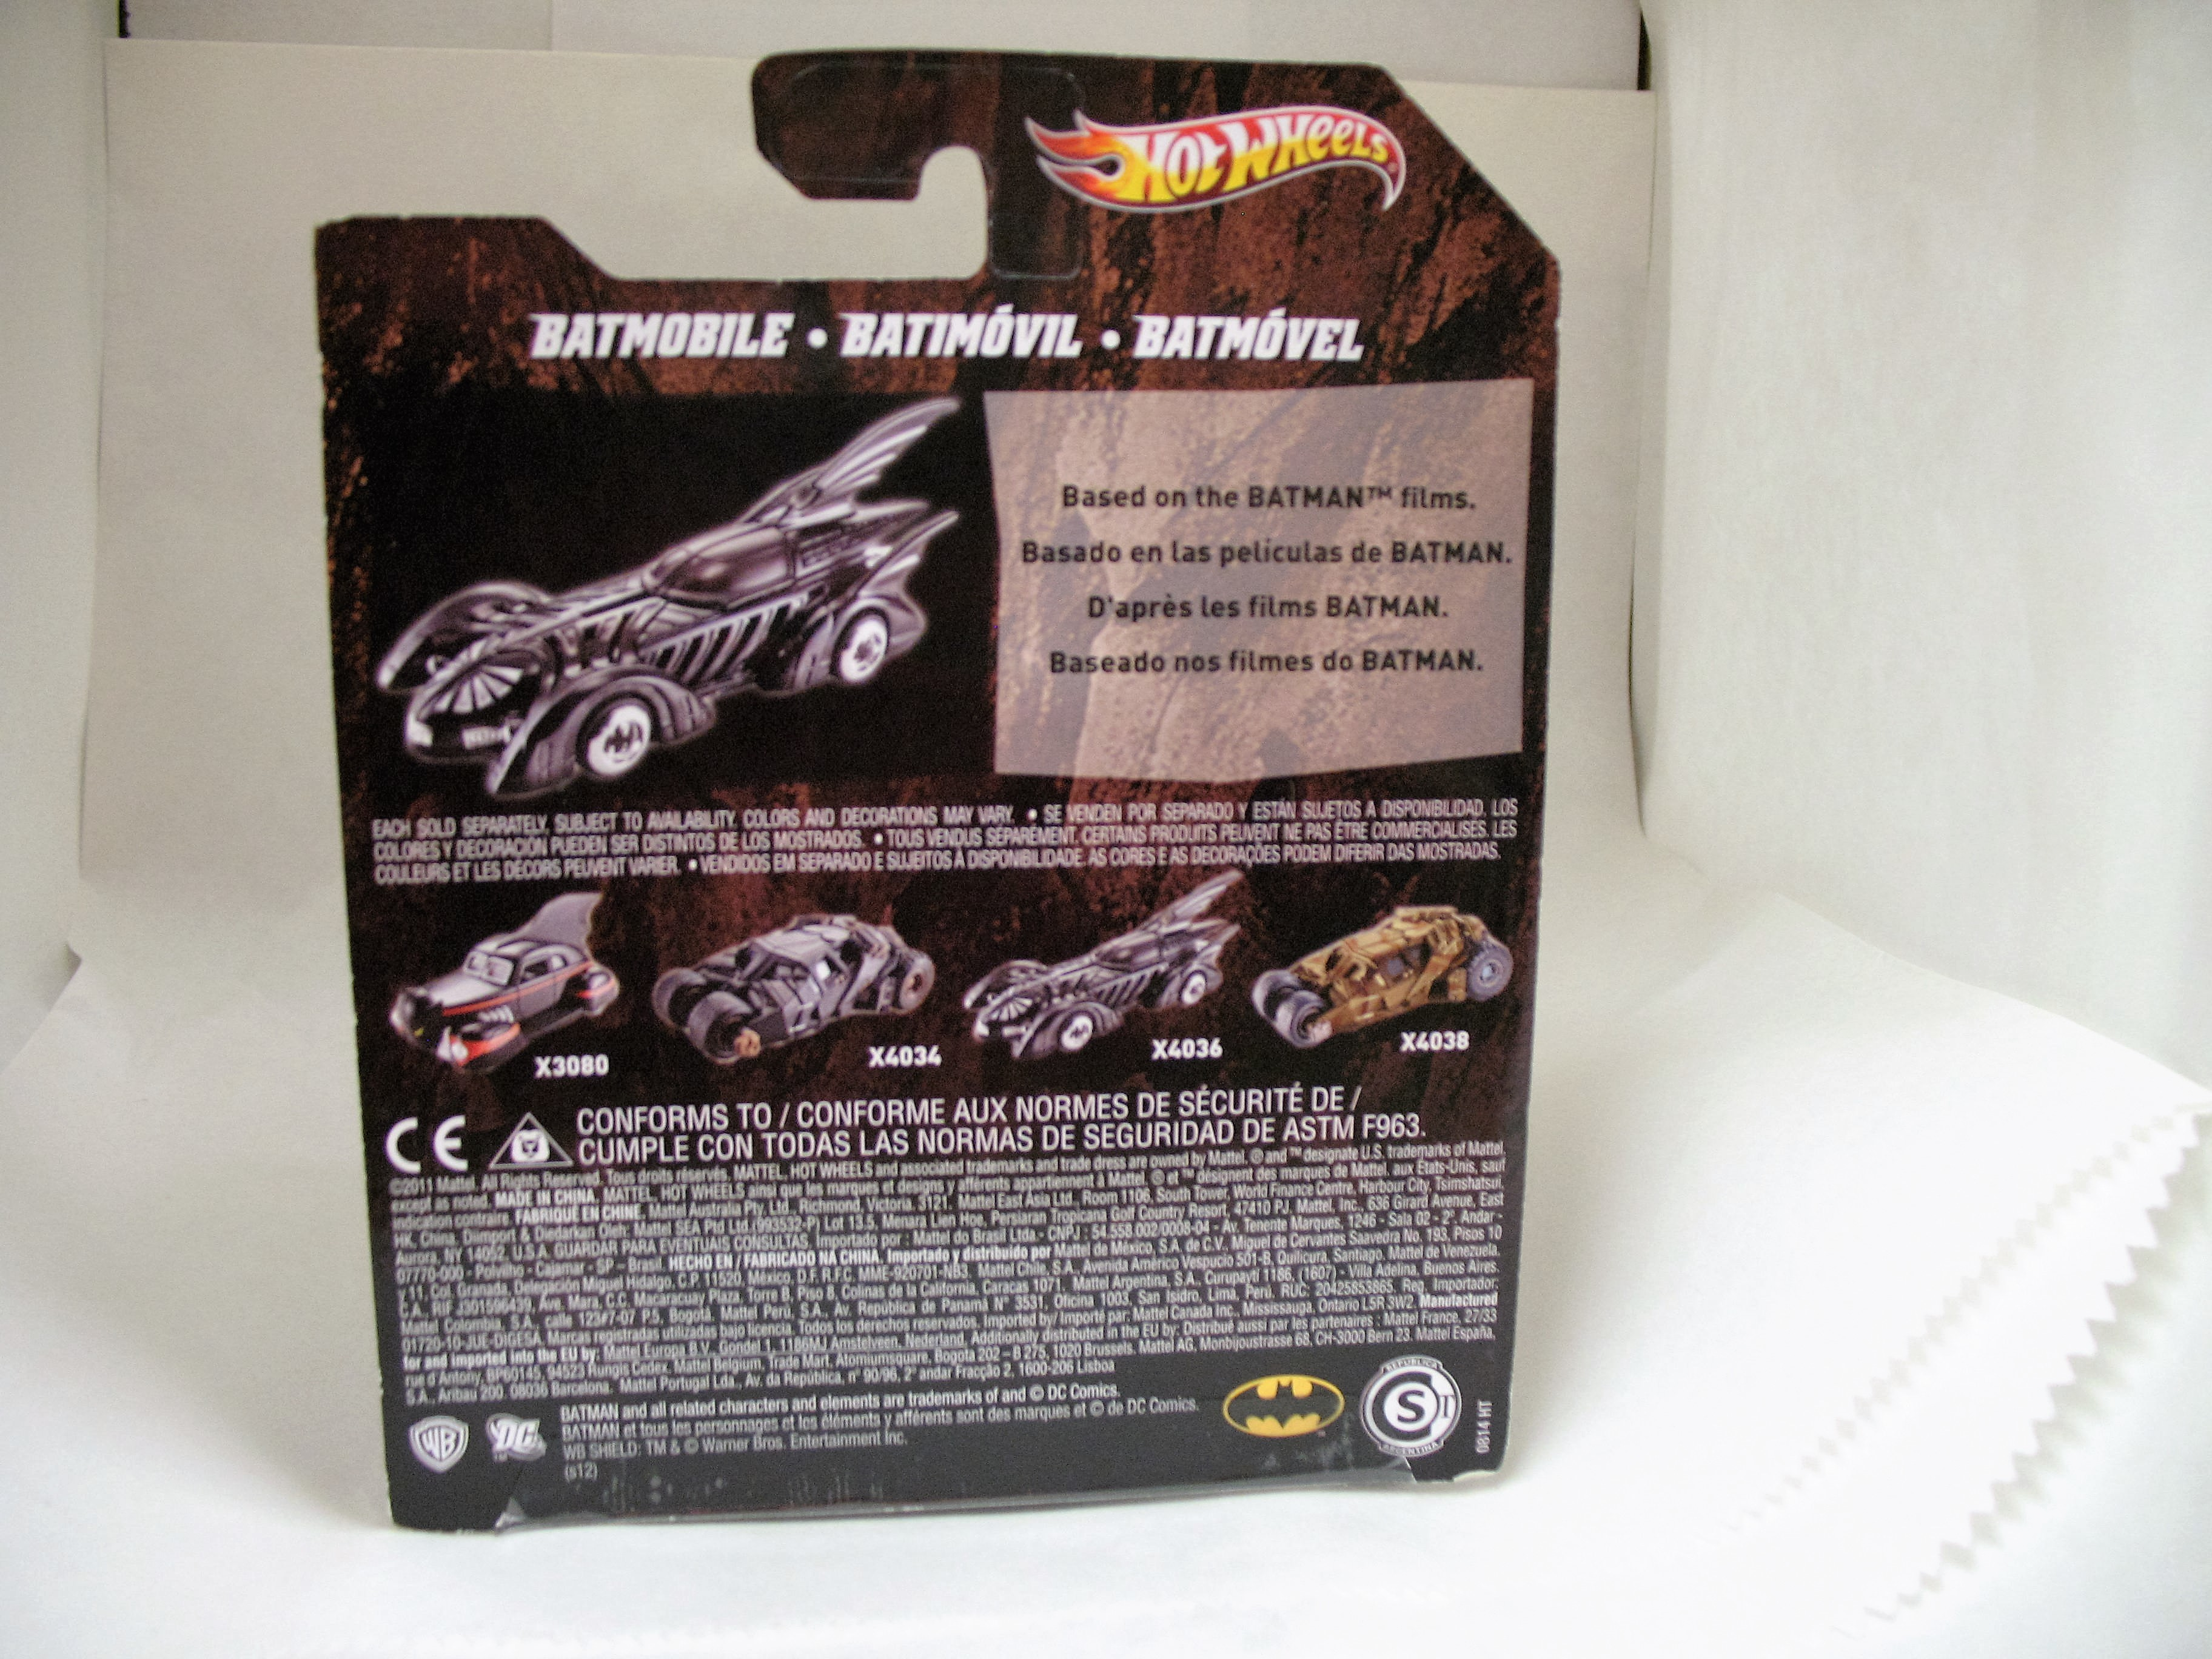 Filme Do Hot Wheels pertaining to hot wheels 2011 batman forever batmobile x4036 1:50 scale mattel